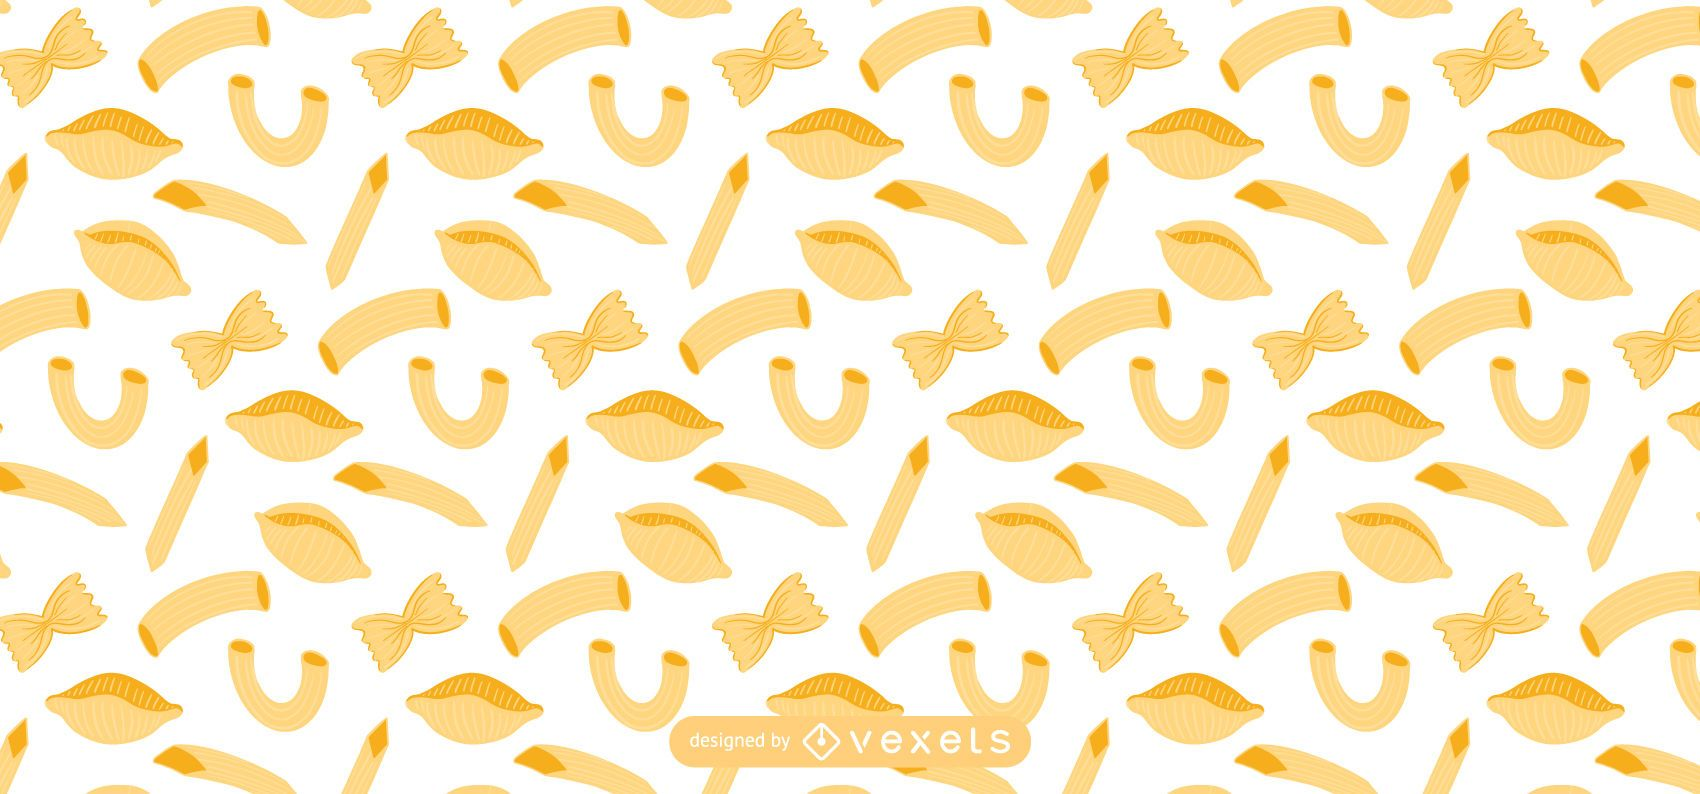 Flat pasta pattern design